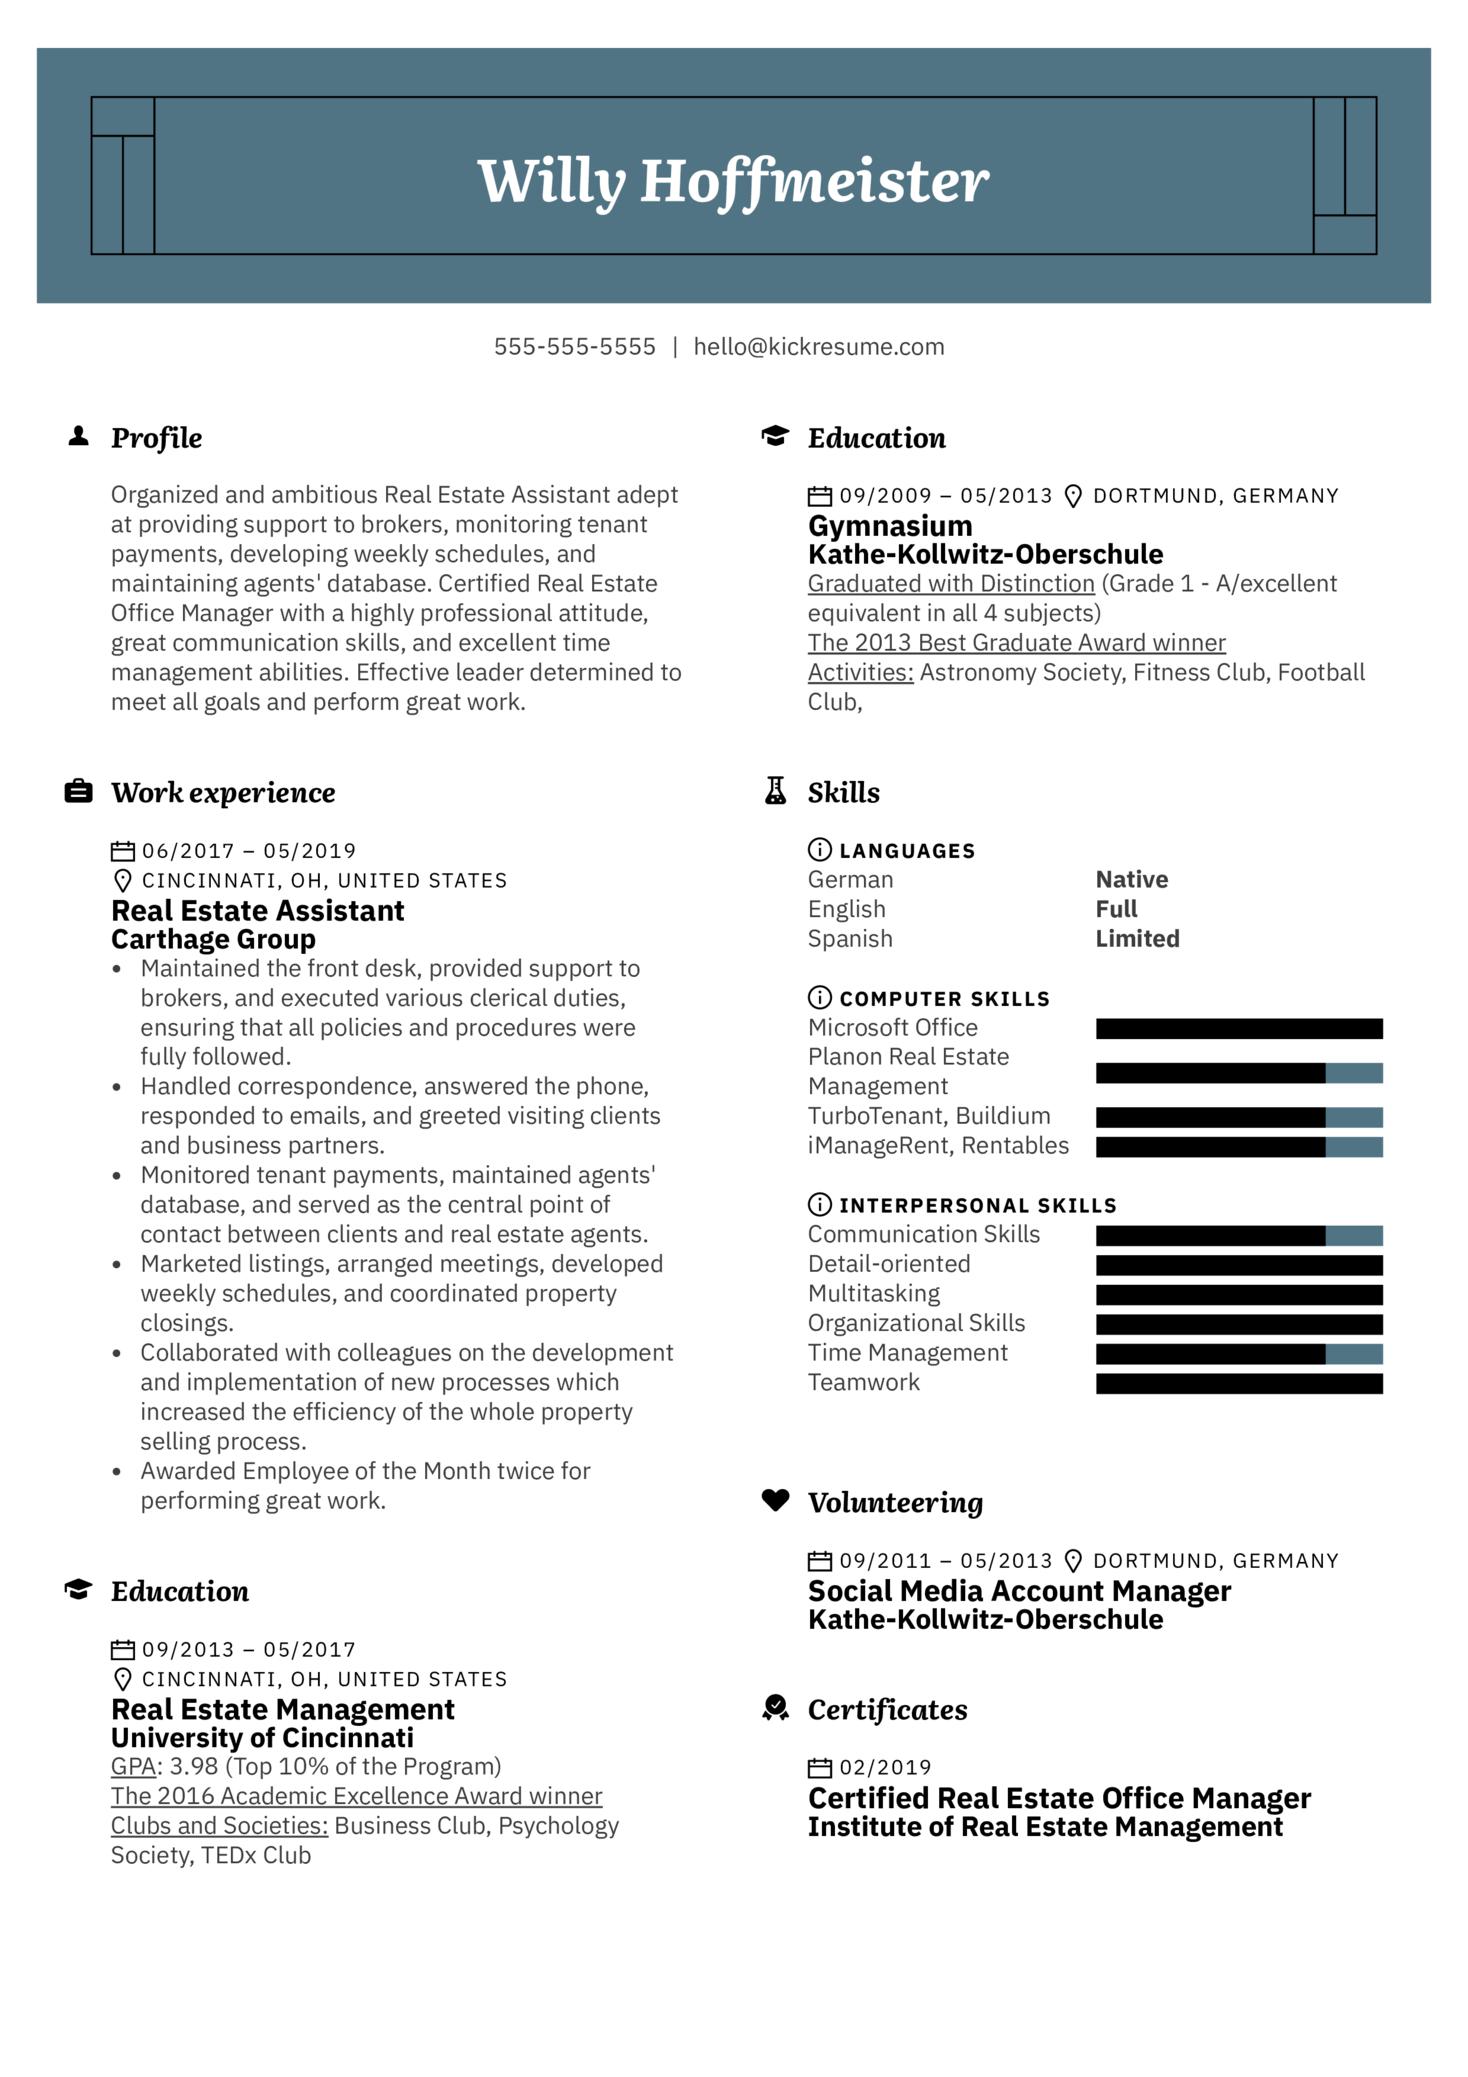 Real Estate Assistant Resume Sample (parte 1)